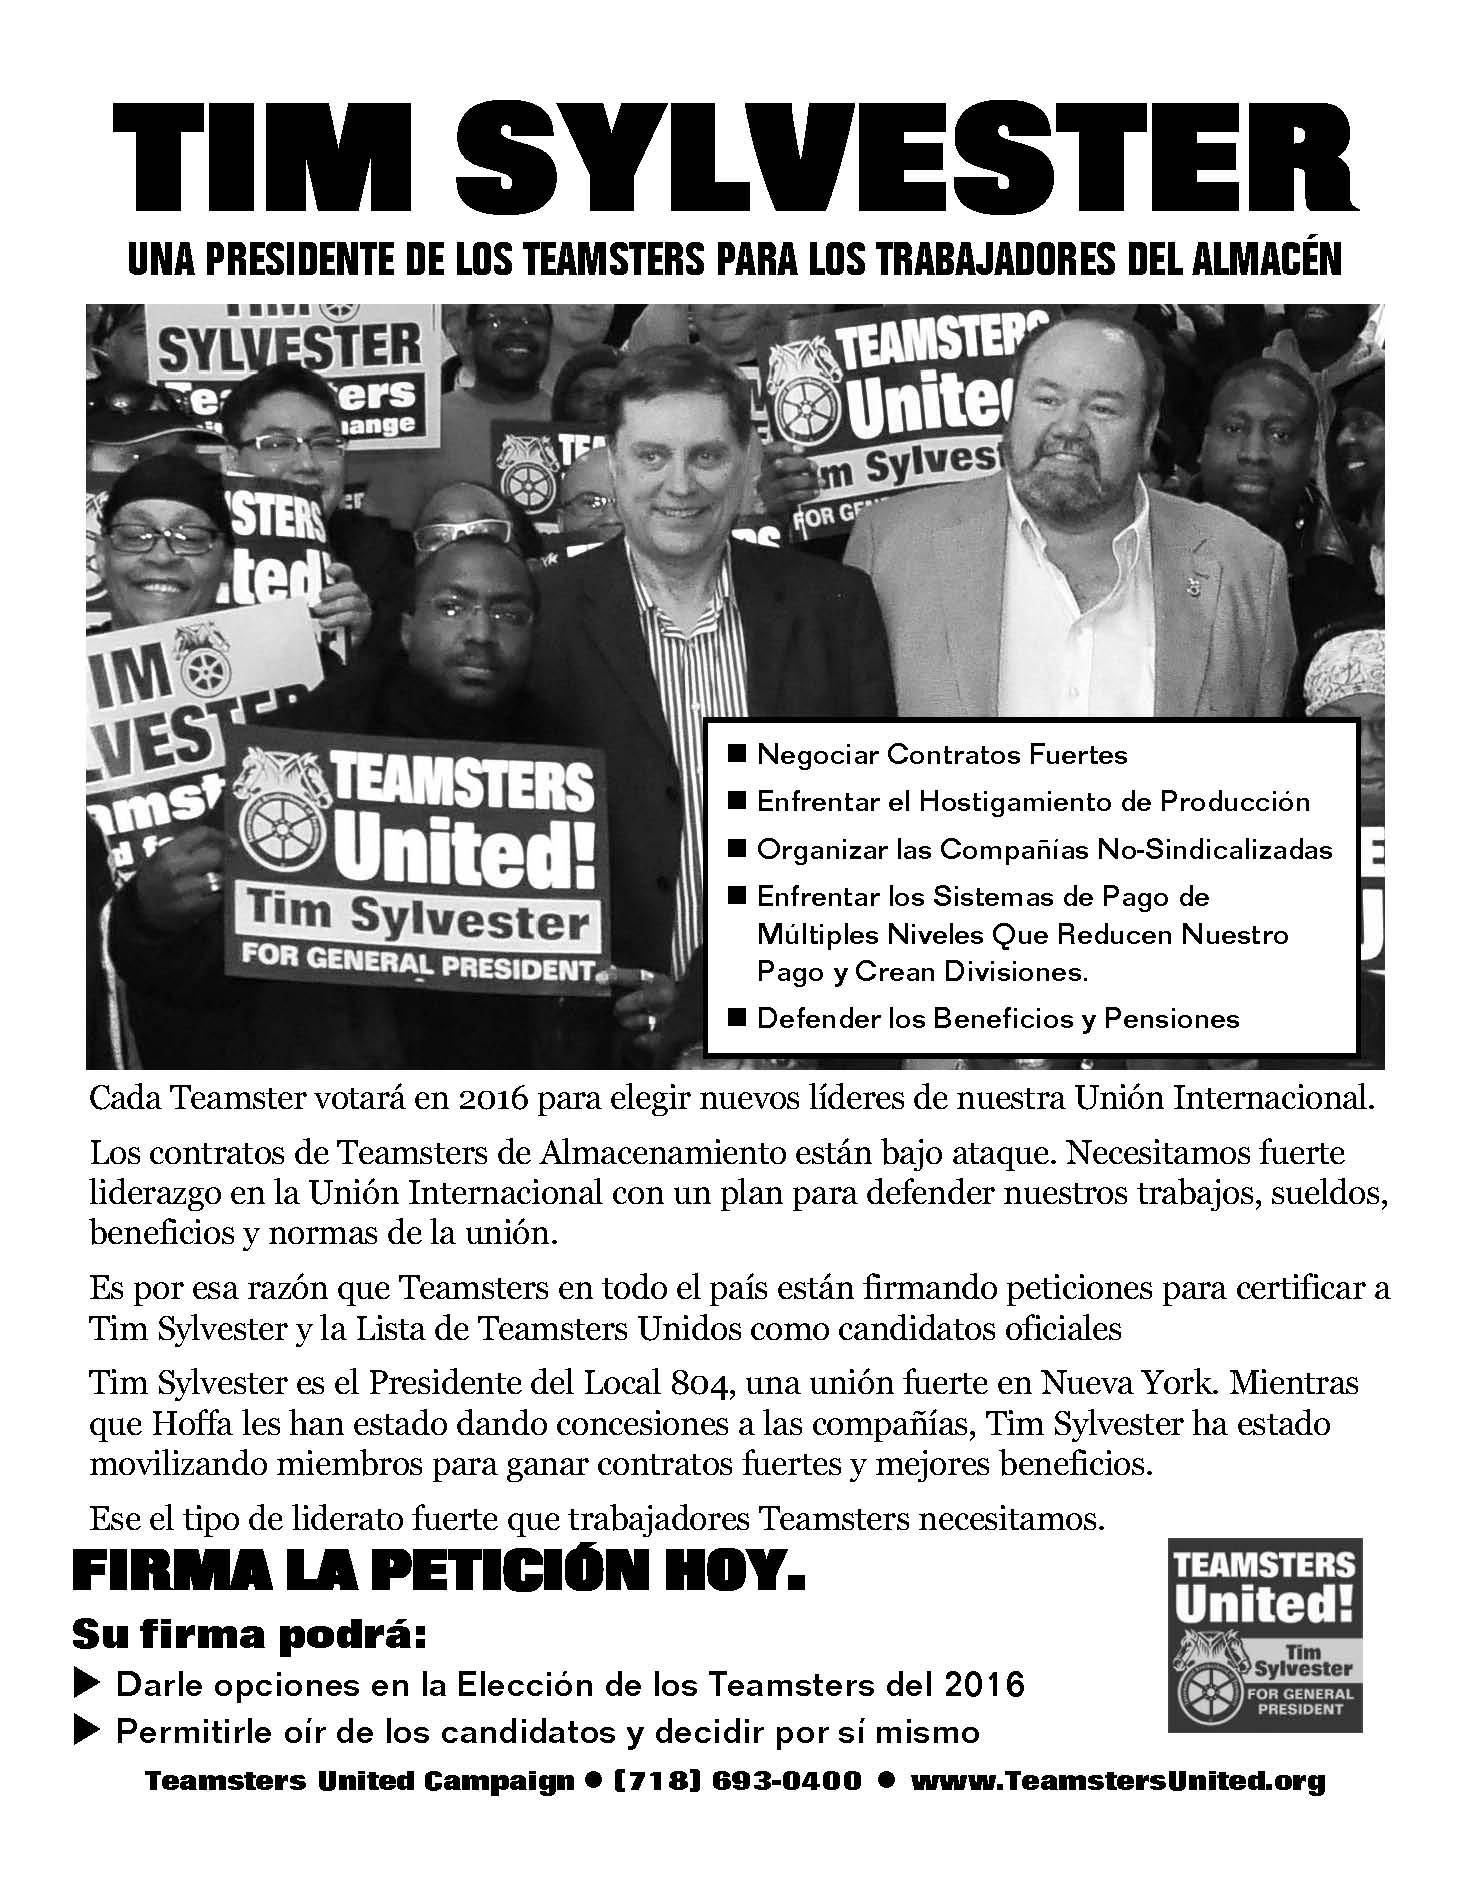 petition-leaflet-warehouse-SPANISH.jpg